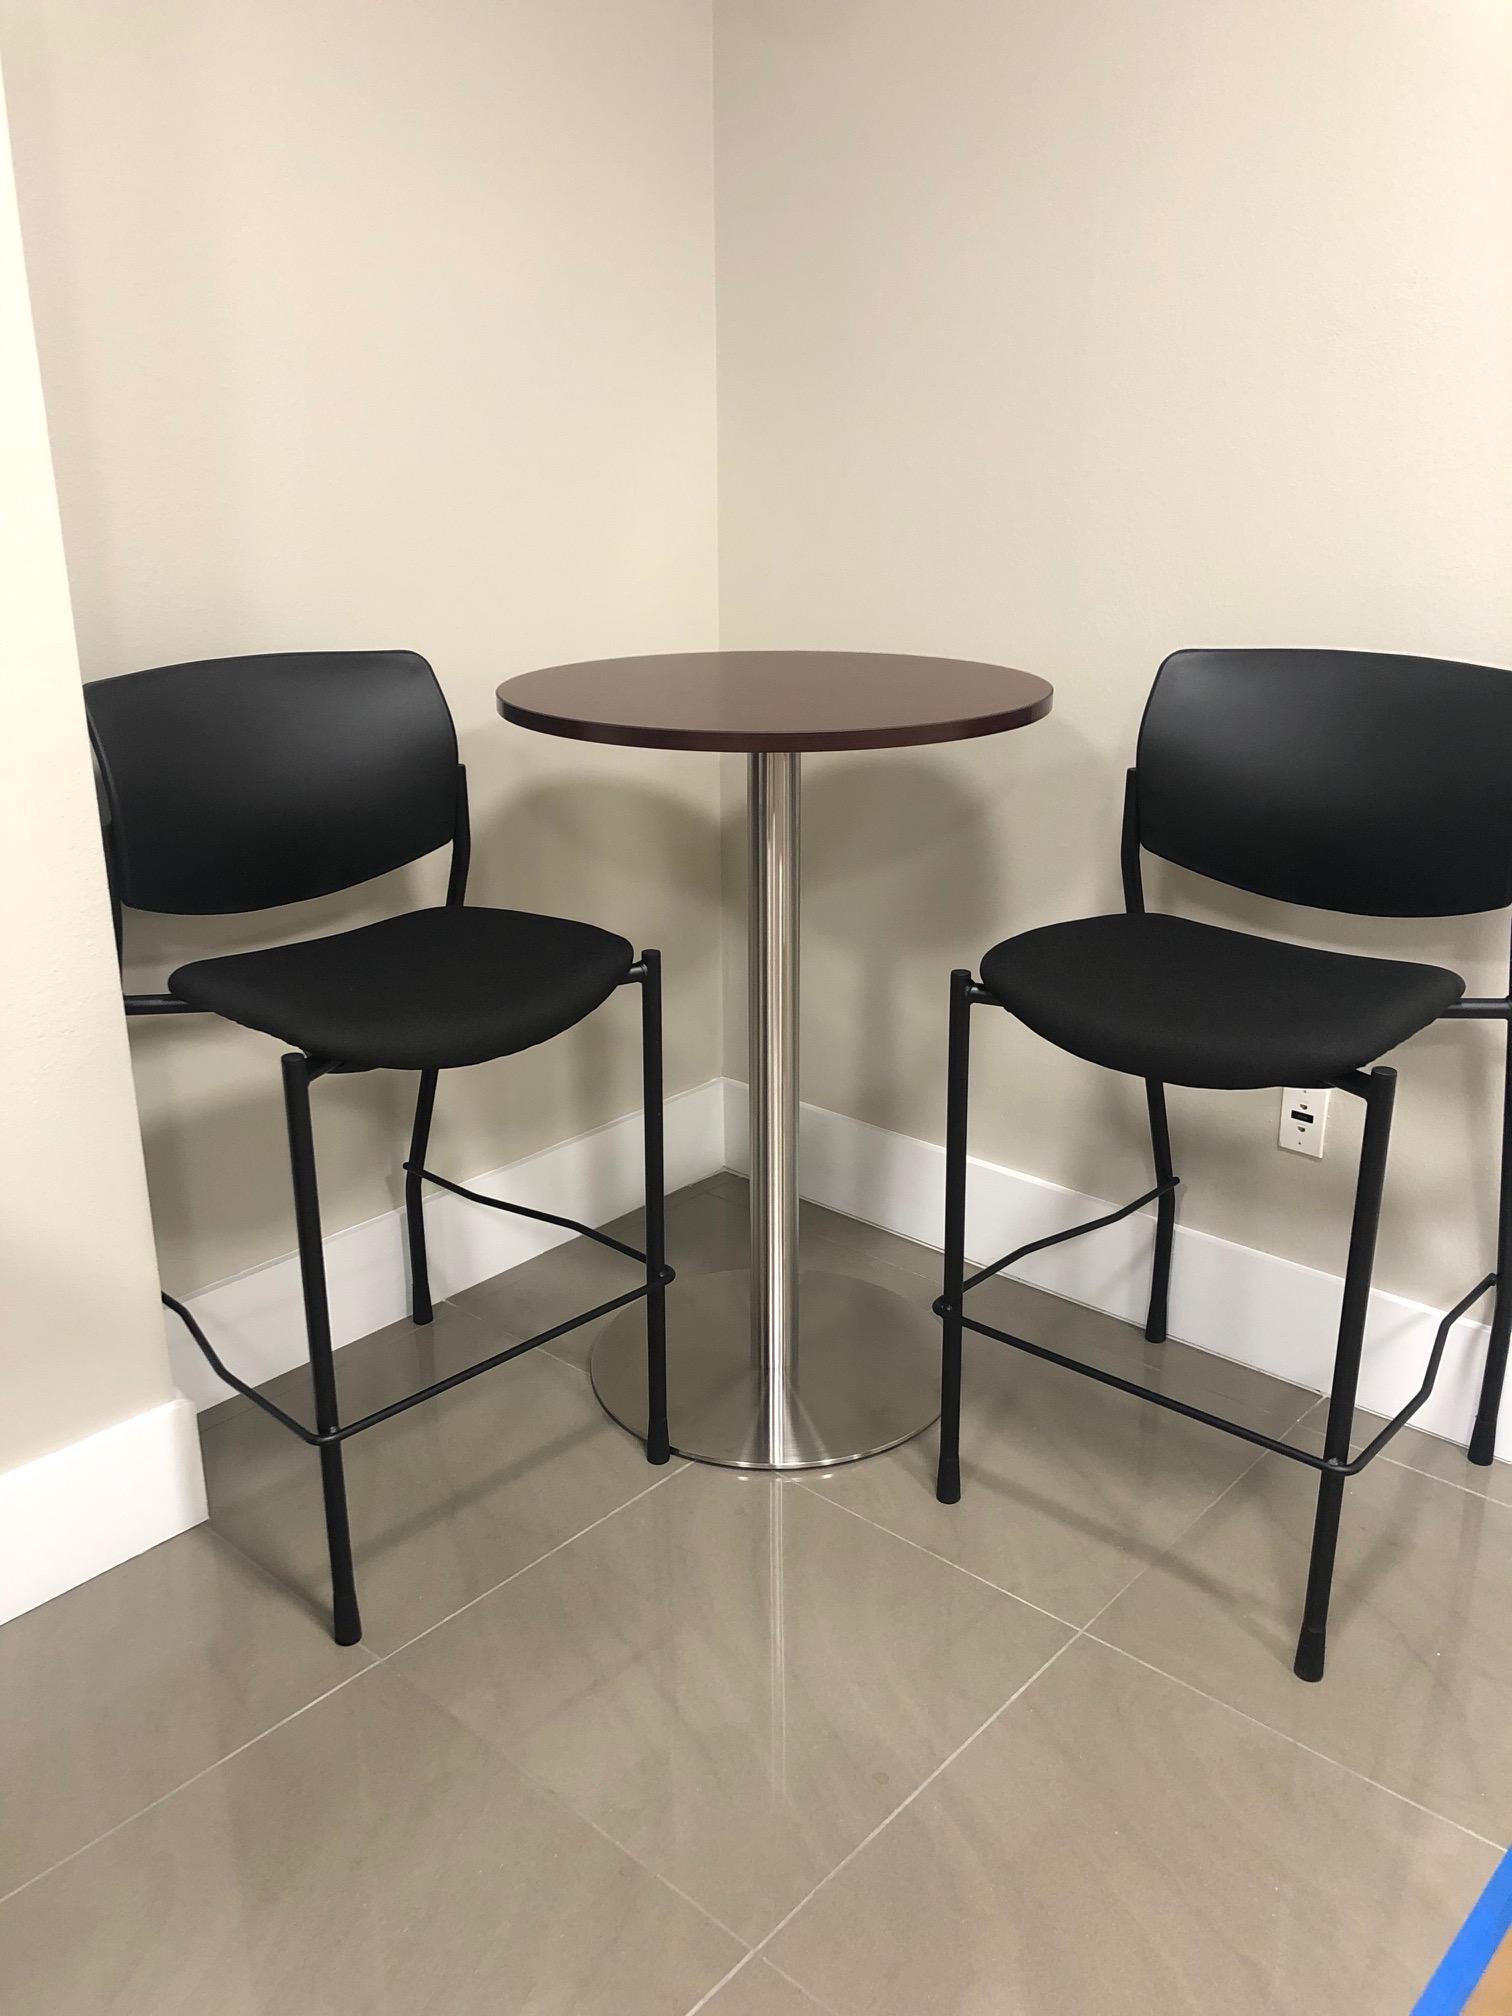 furniture-office-supplies-in-bradenton-florida-1.1.png